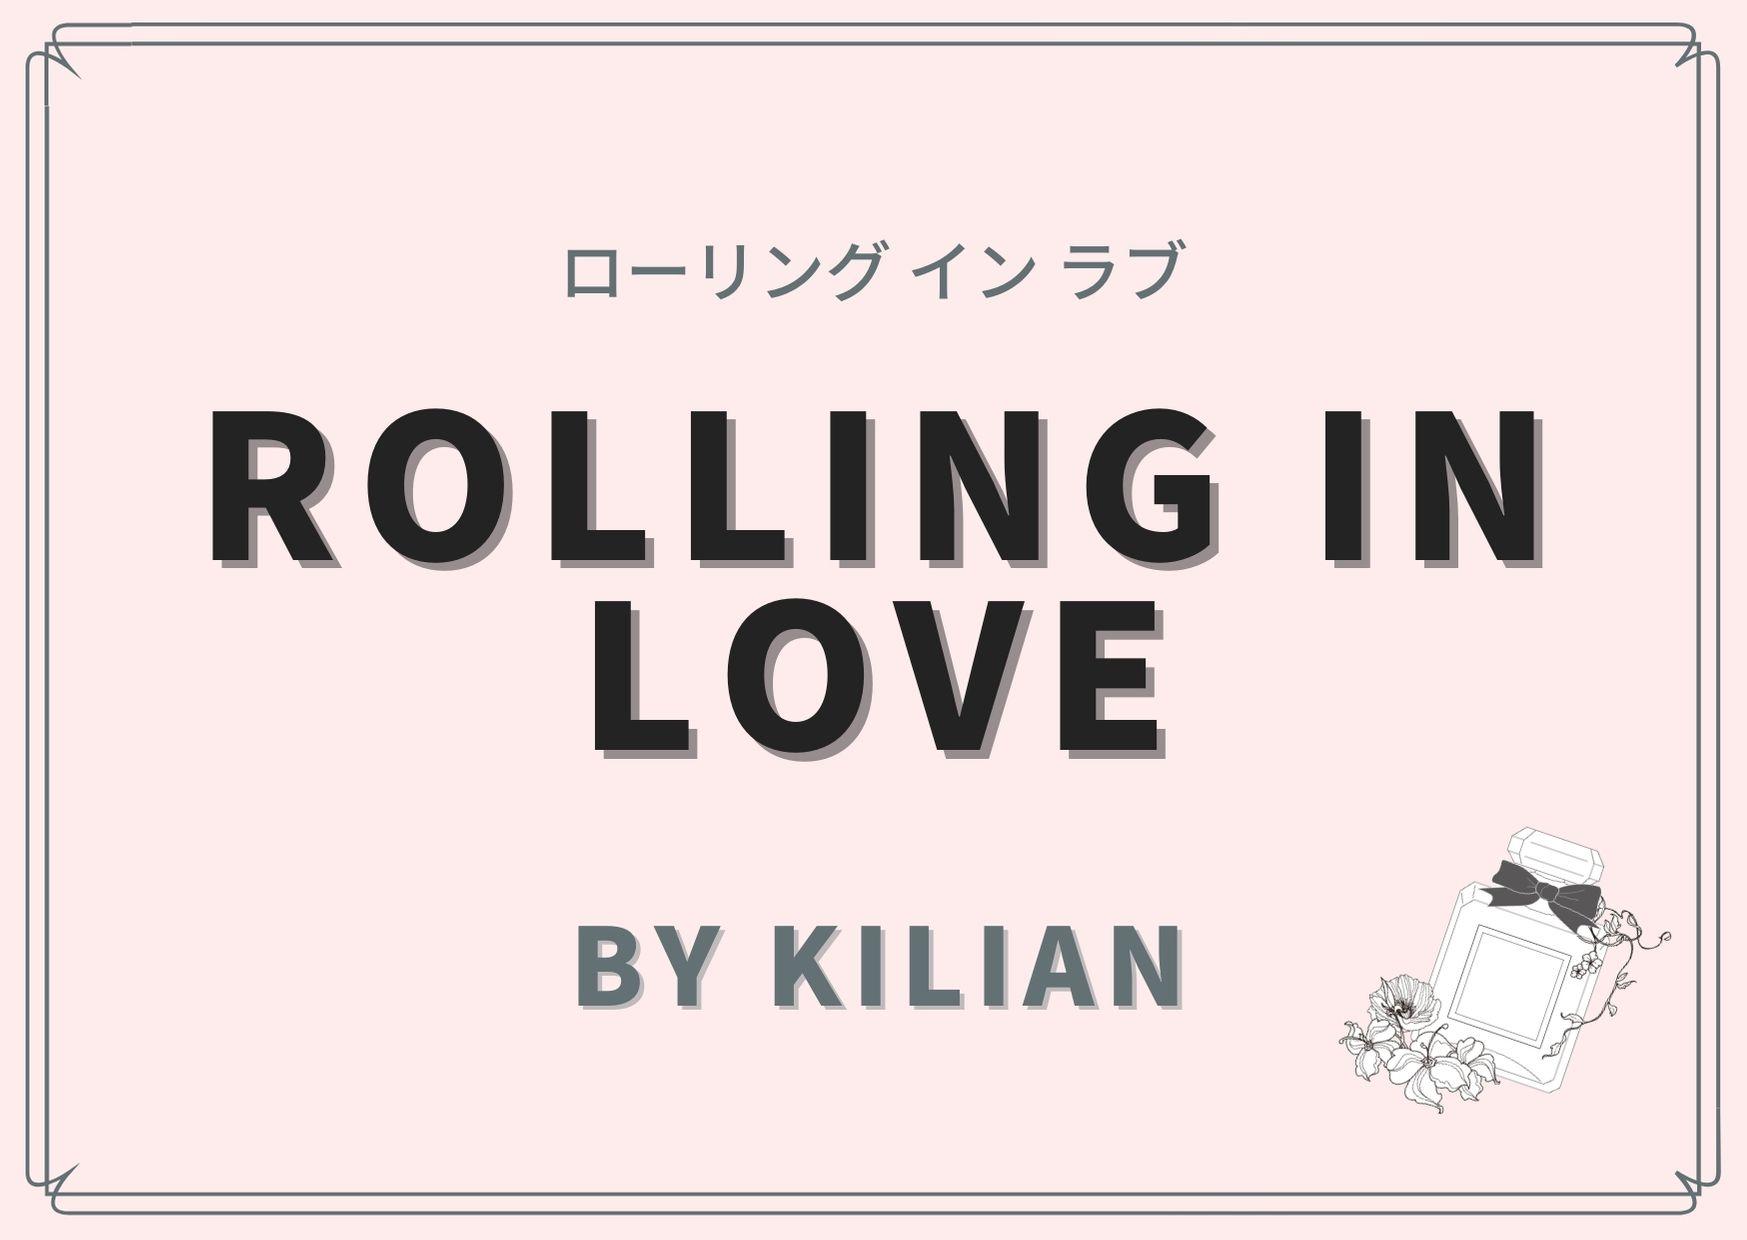 ROLLING IN LOVE(ローリング イン ラブ)/ By Kilian(バイ キリアン)